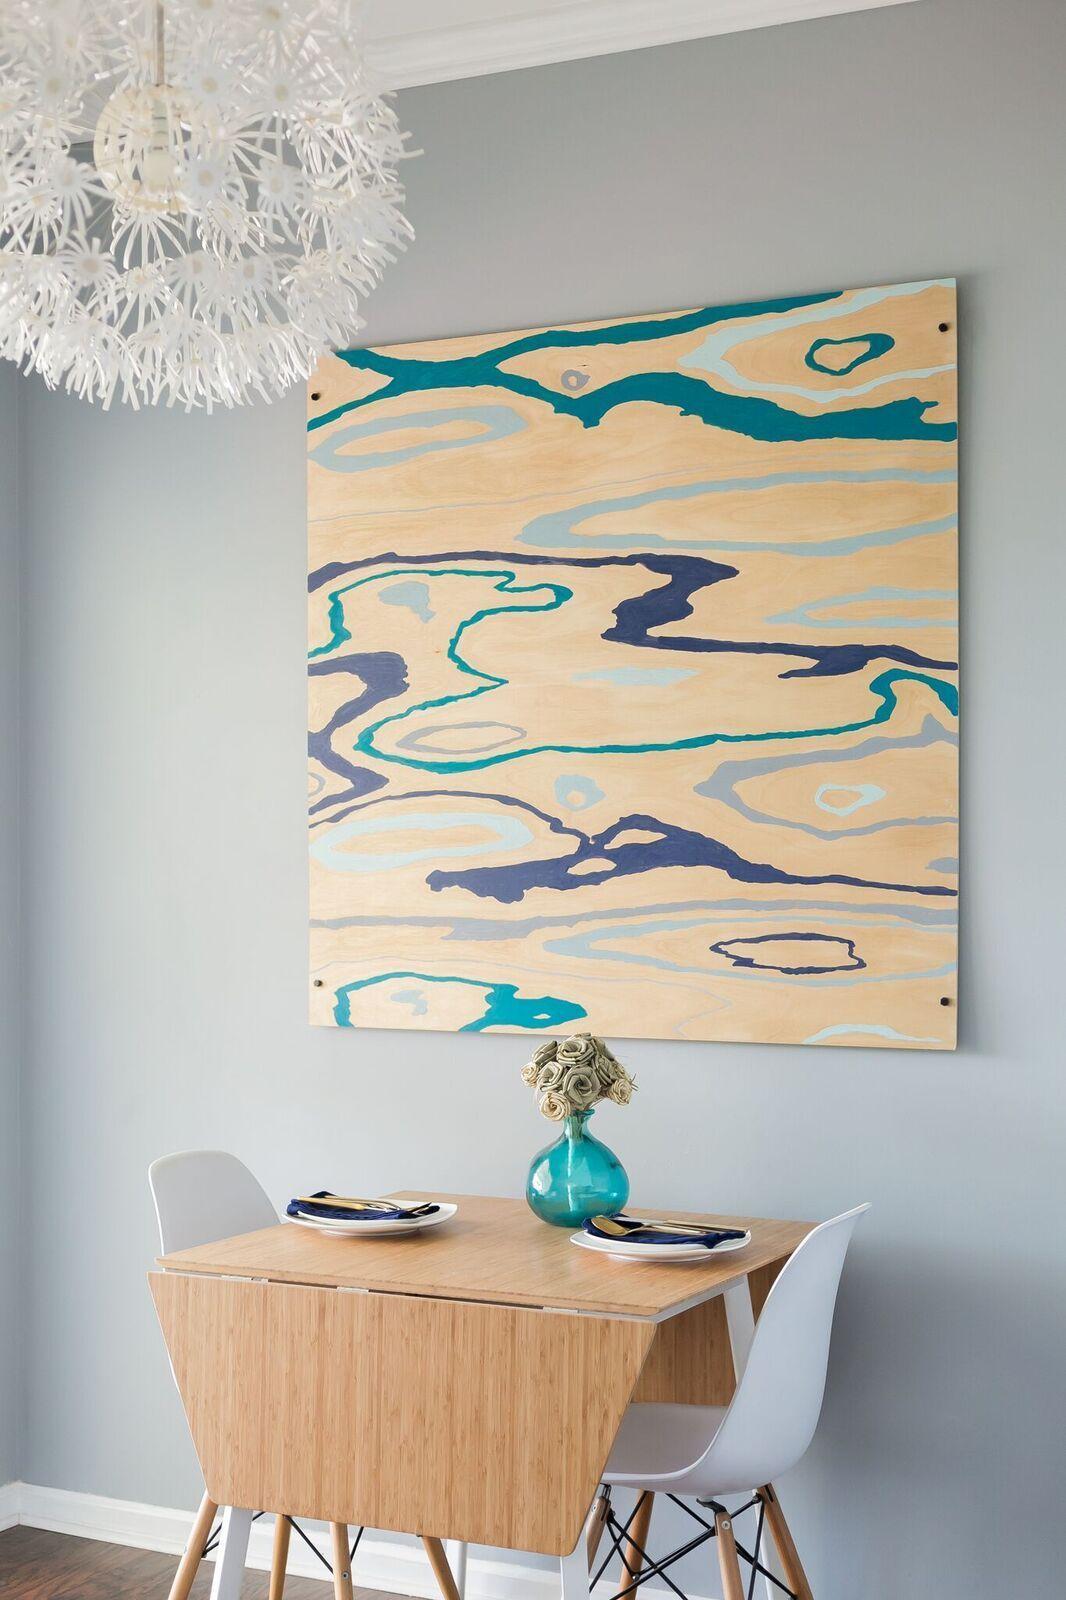 An Easy Diy Wood Grain Painting 3 D Mounting Plywood Diy Diy Wall Painting Wood Diy